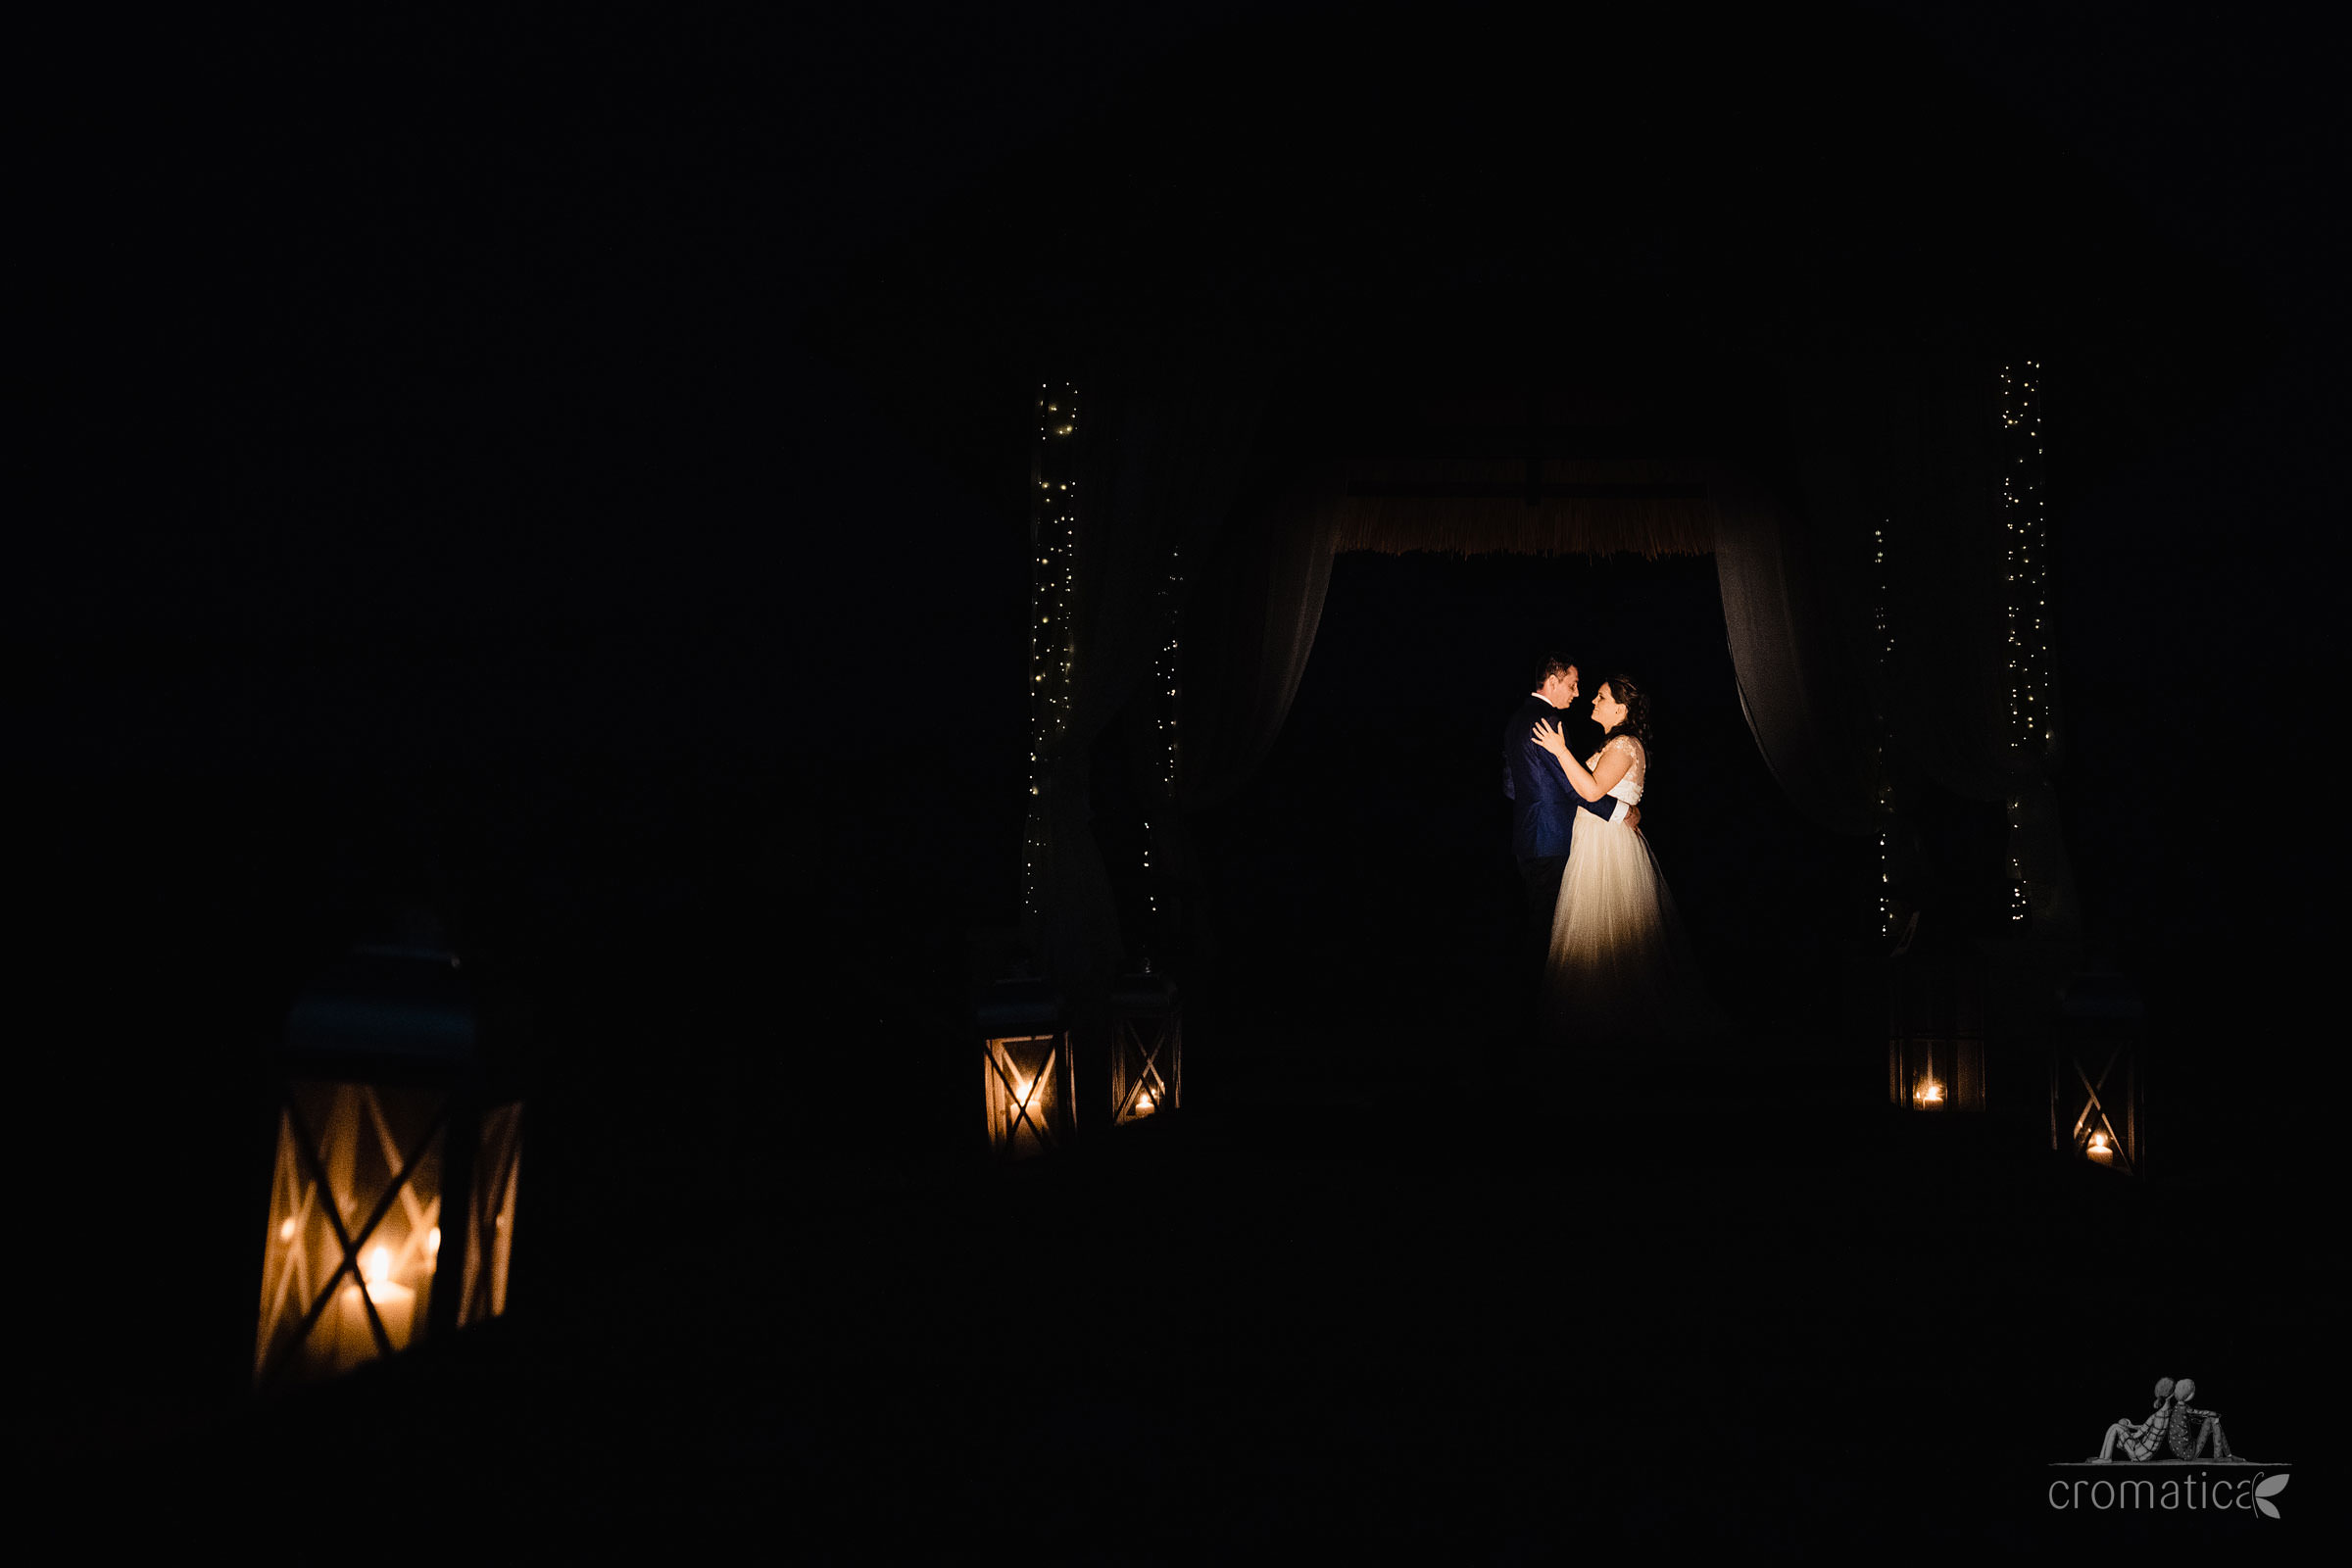 giorgiana constantin fotografii nunta delta royal delta dunarii 061